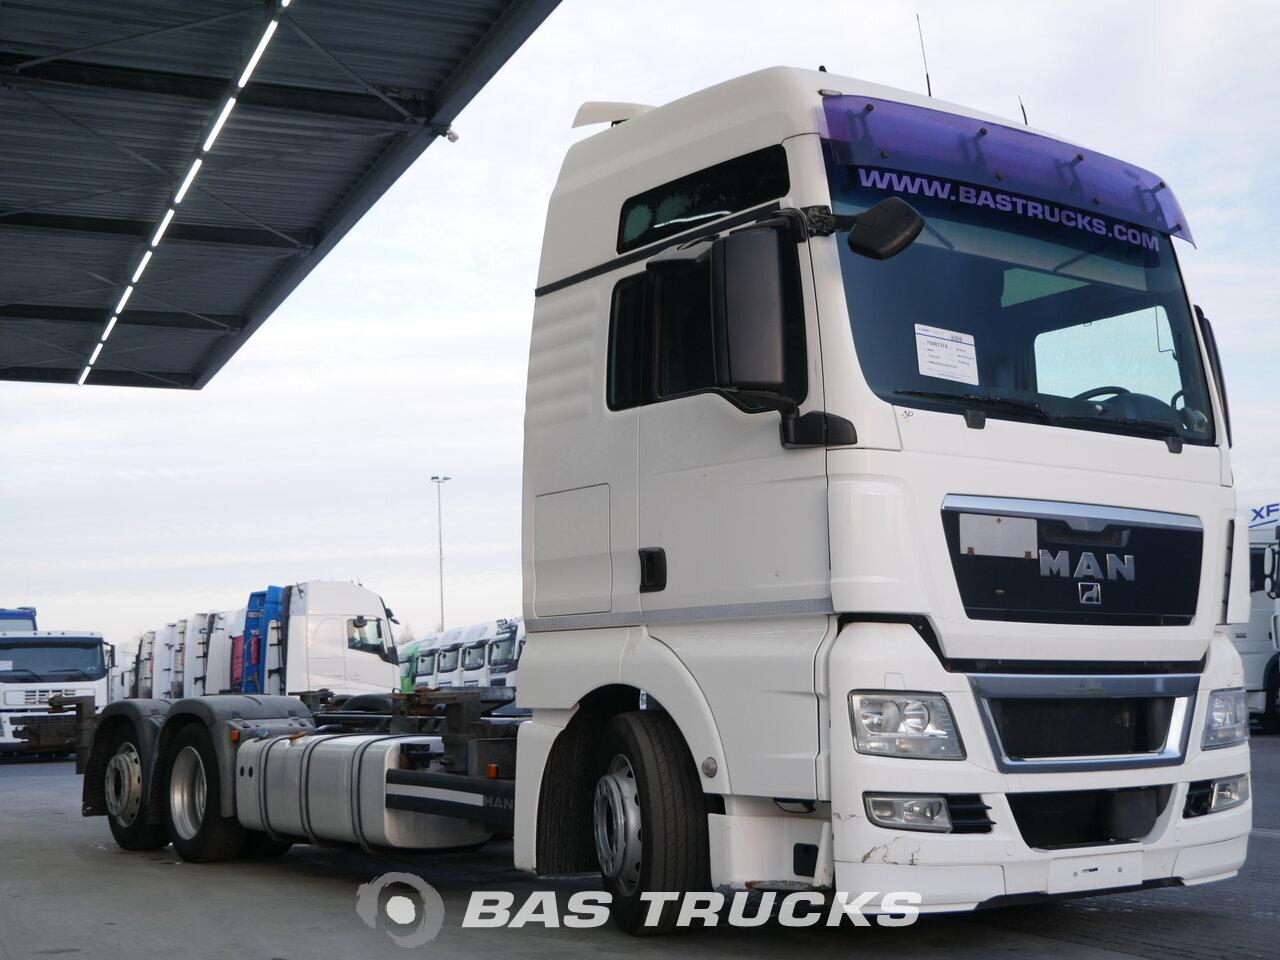 man tgx xxl kamion euro norma 5 11900 bas trucks. Black Bedroom Furniture Sets. Home Design Ideas